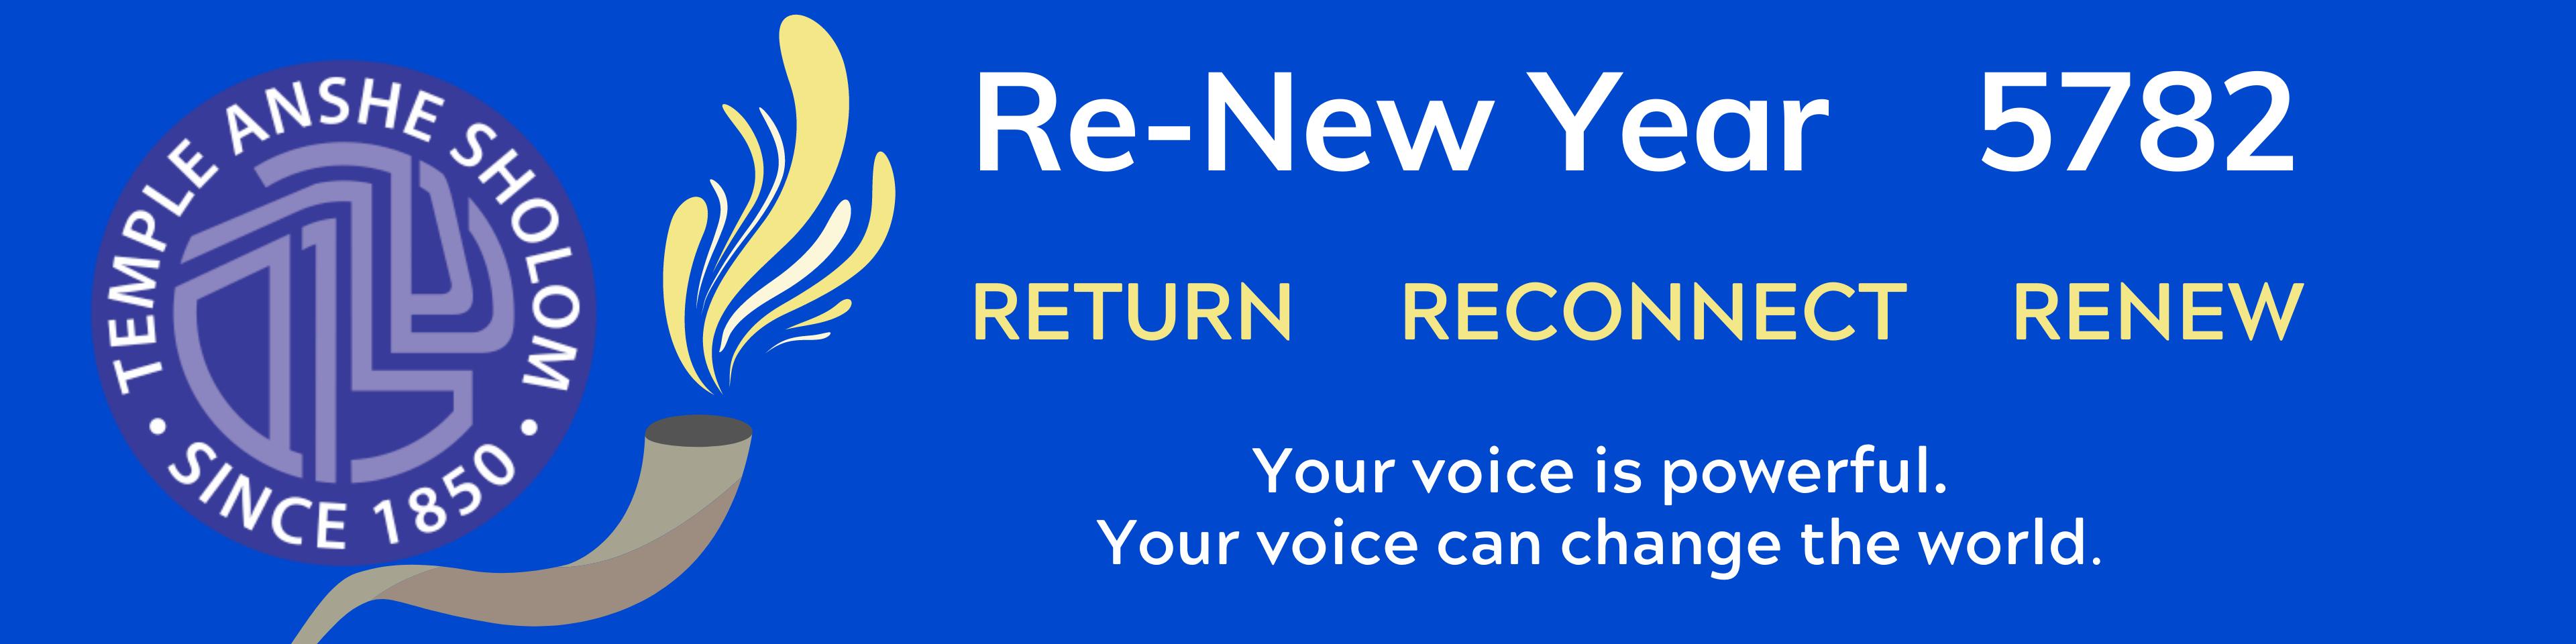 renew year banner